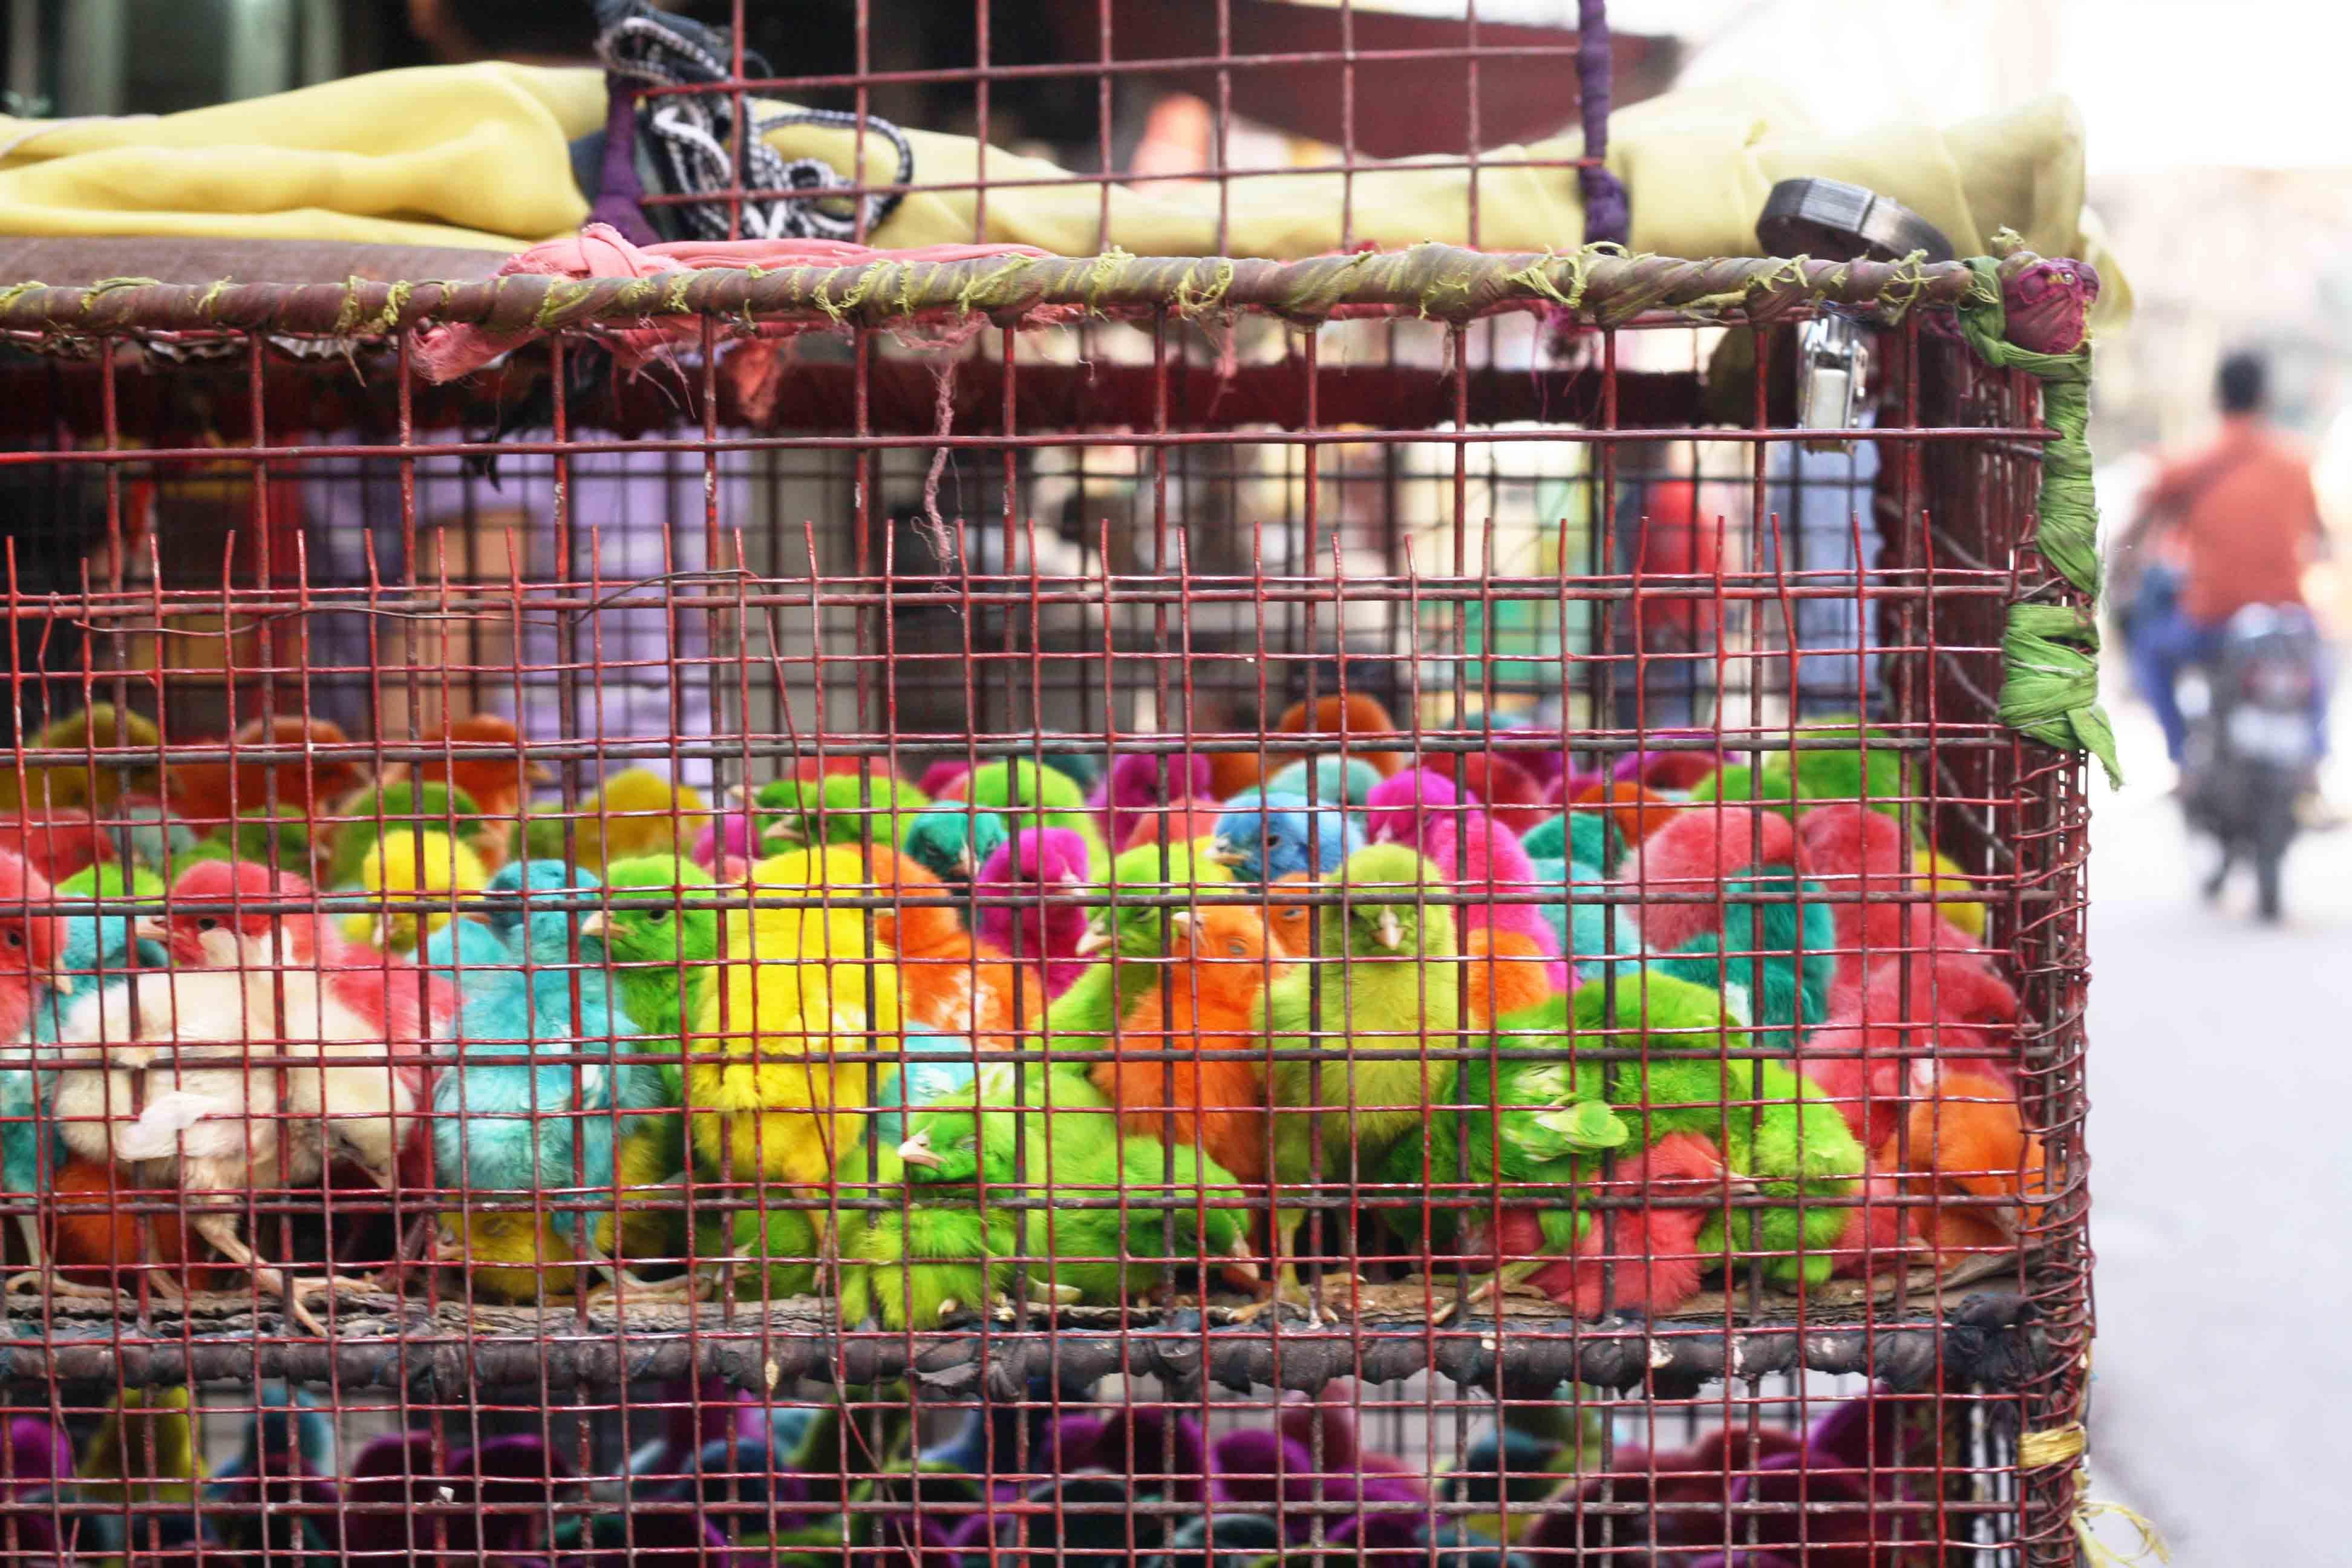 City Moment – Dyed Chicks, Okhla